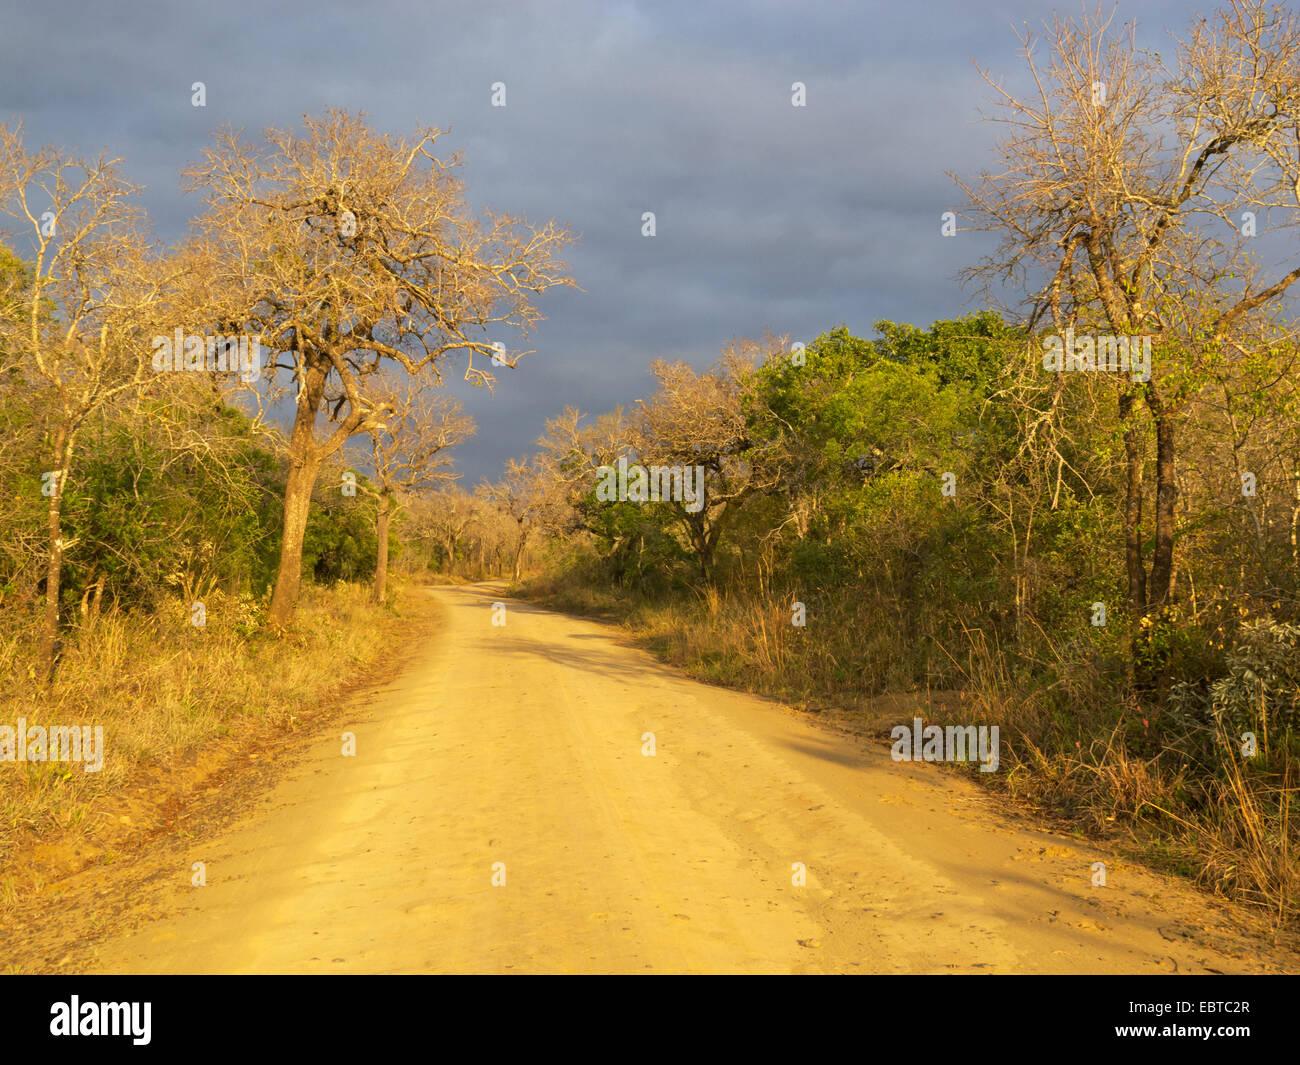 unpaved road in savanna, South Africa, Hluhluwe-Umfolozi National Park, Hilltop Camp - Stock Image